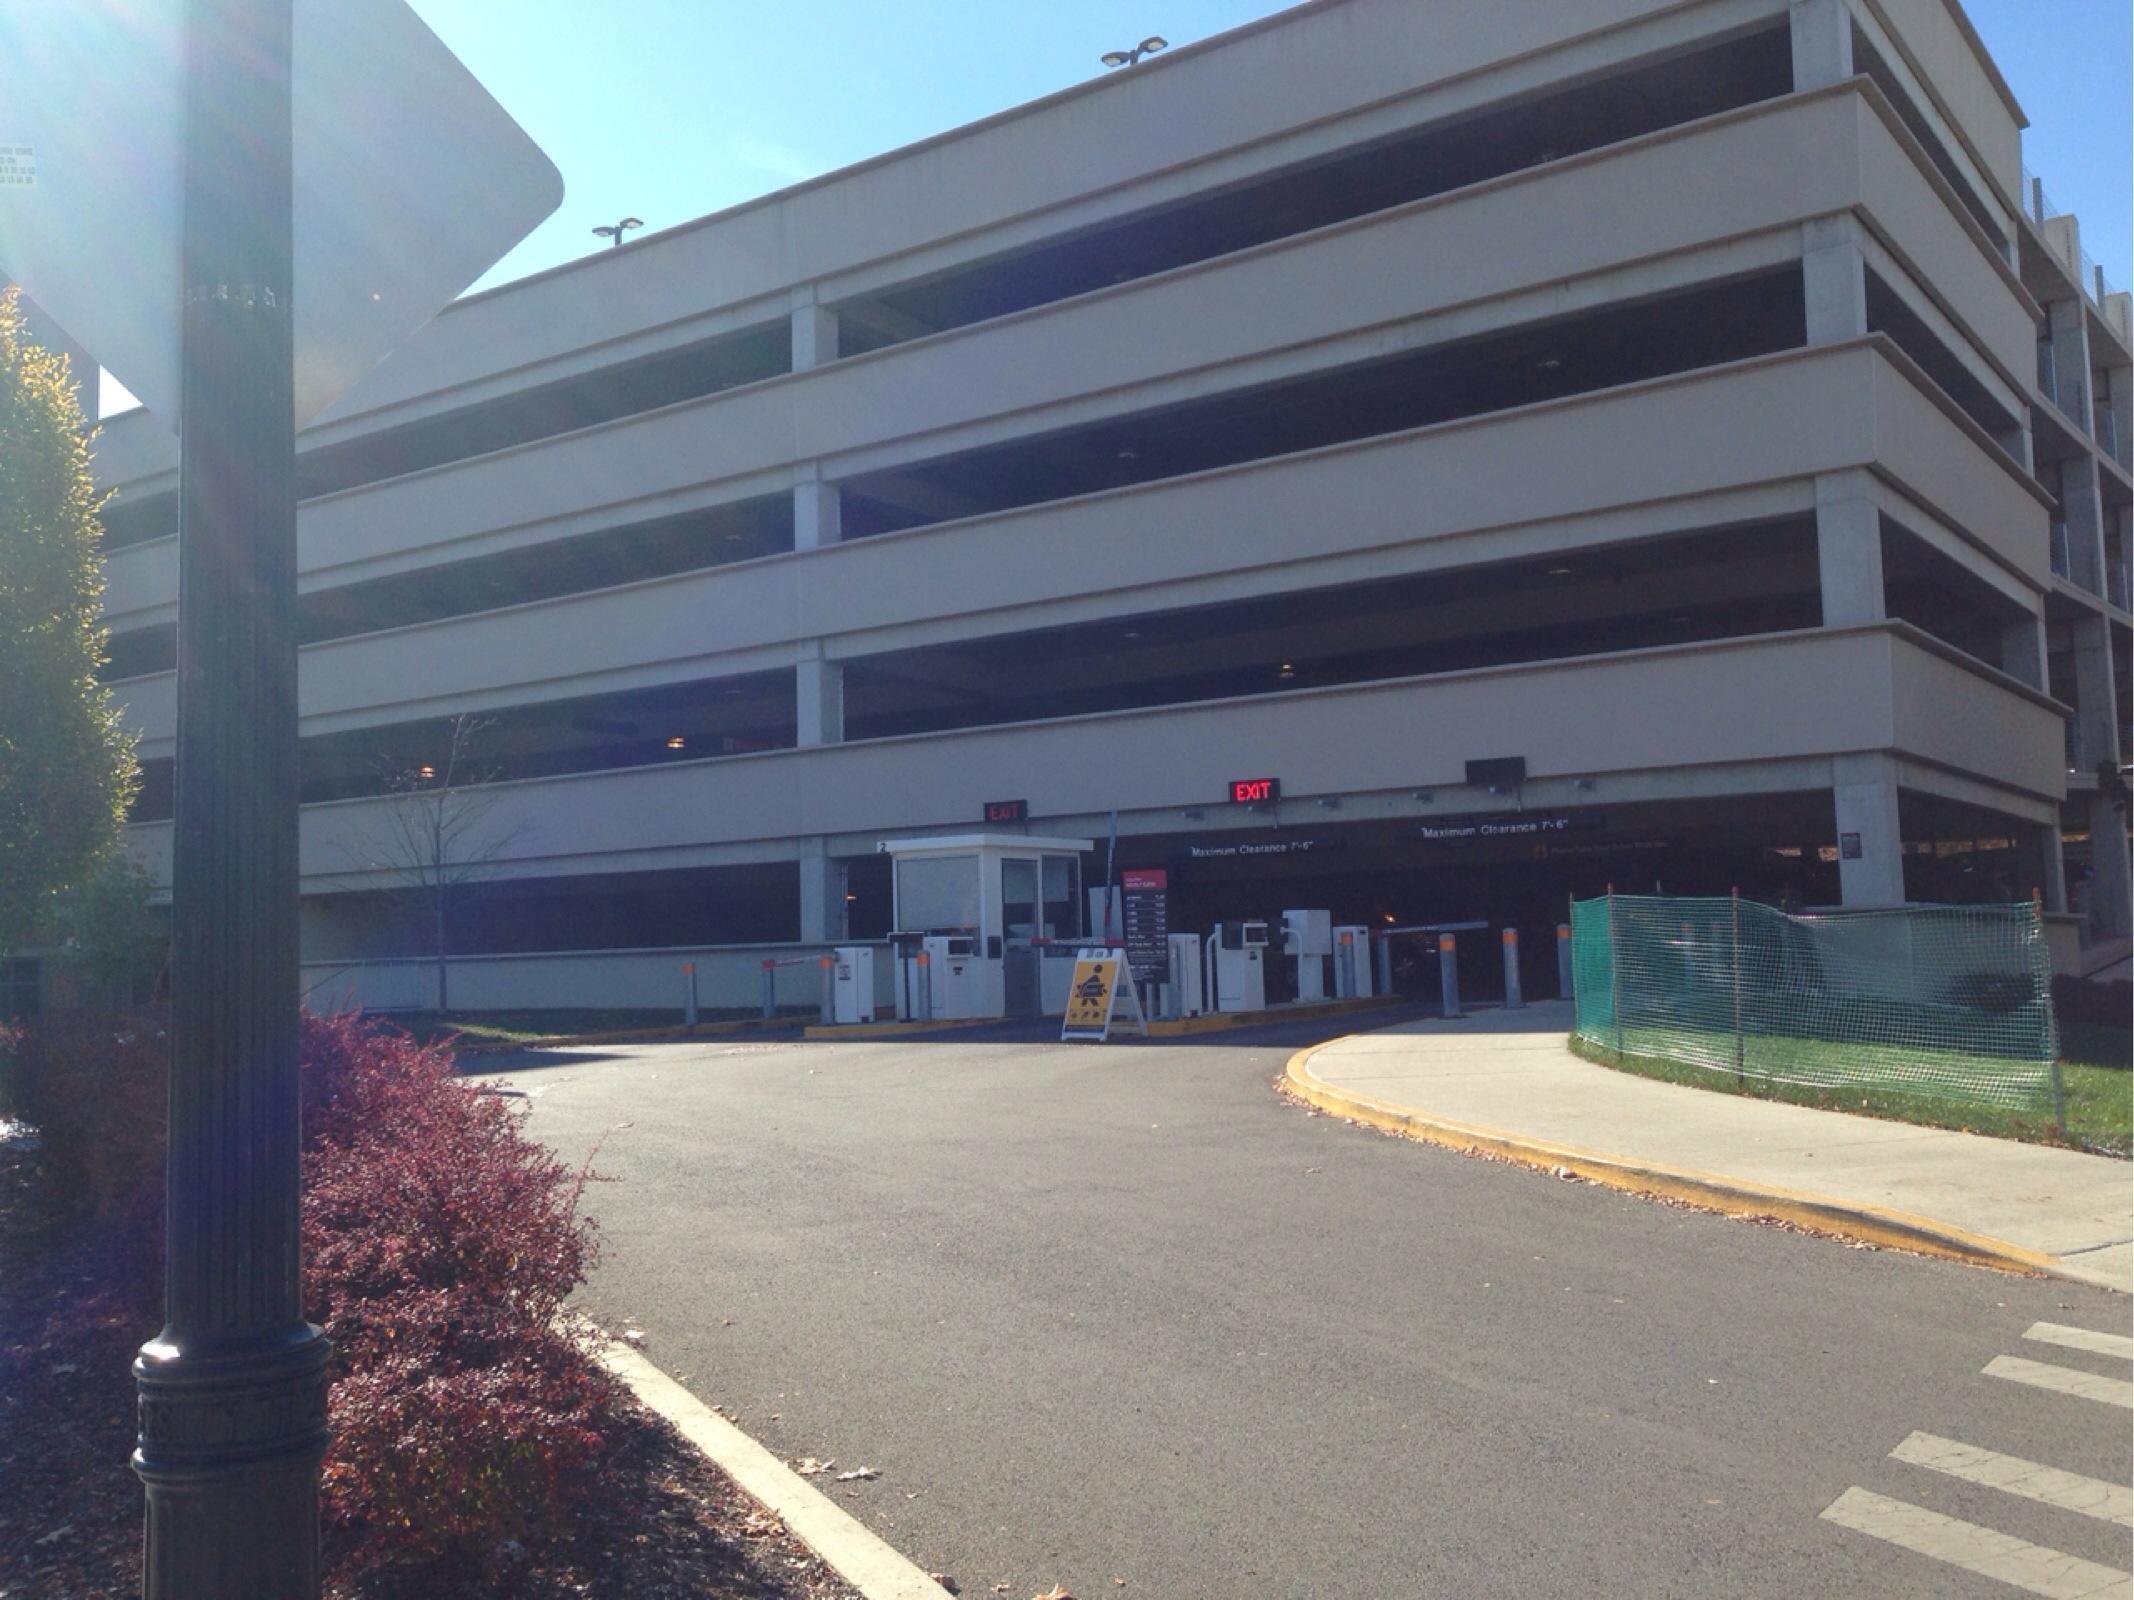 Ohio union south garage parking in columbus parkme for Ohio garage mandelieu